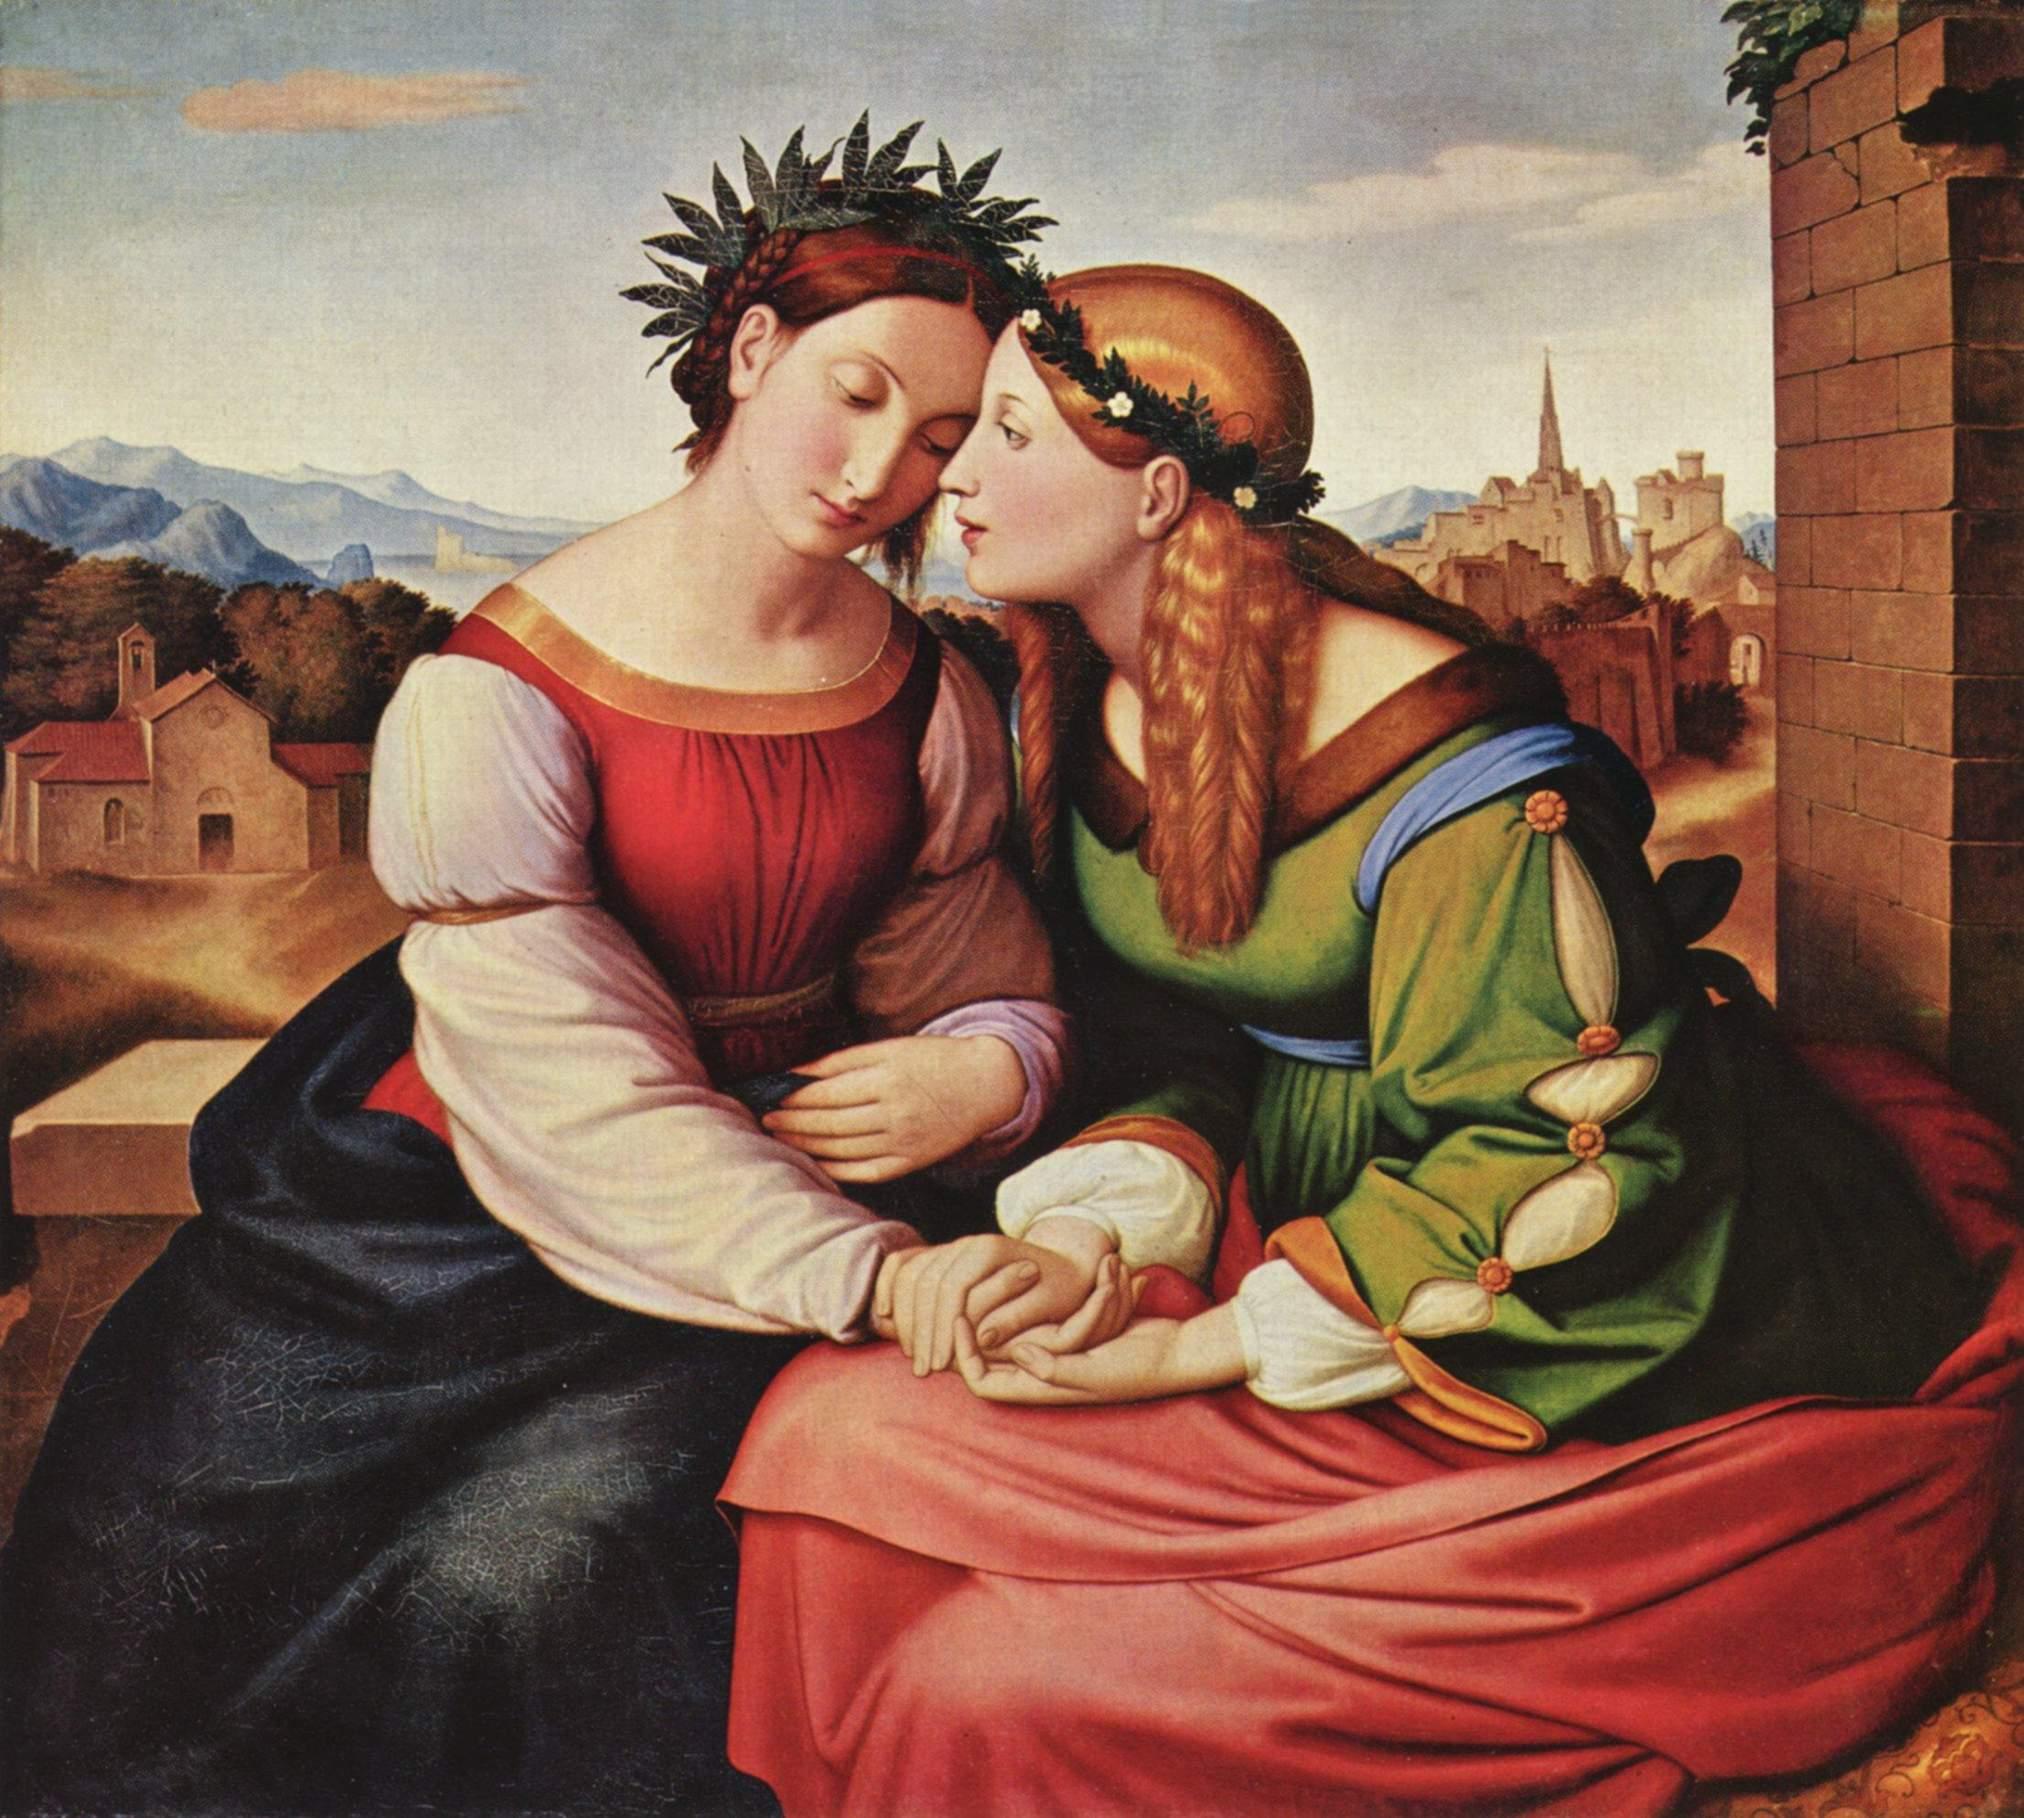 Friedrich Overbeck. Germania und Italia. 1811-1823. Öl / Leinwand. 94 x 104cm